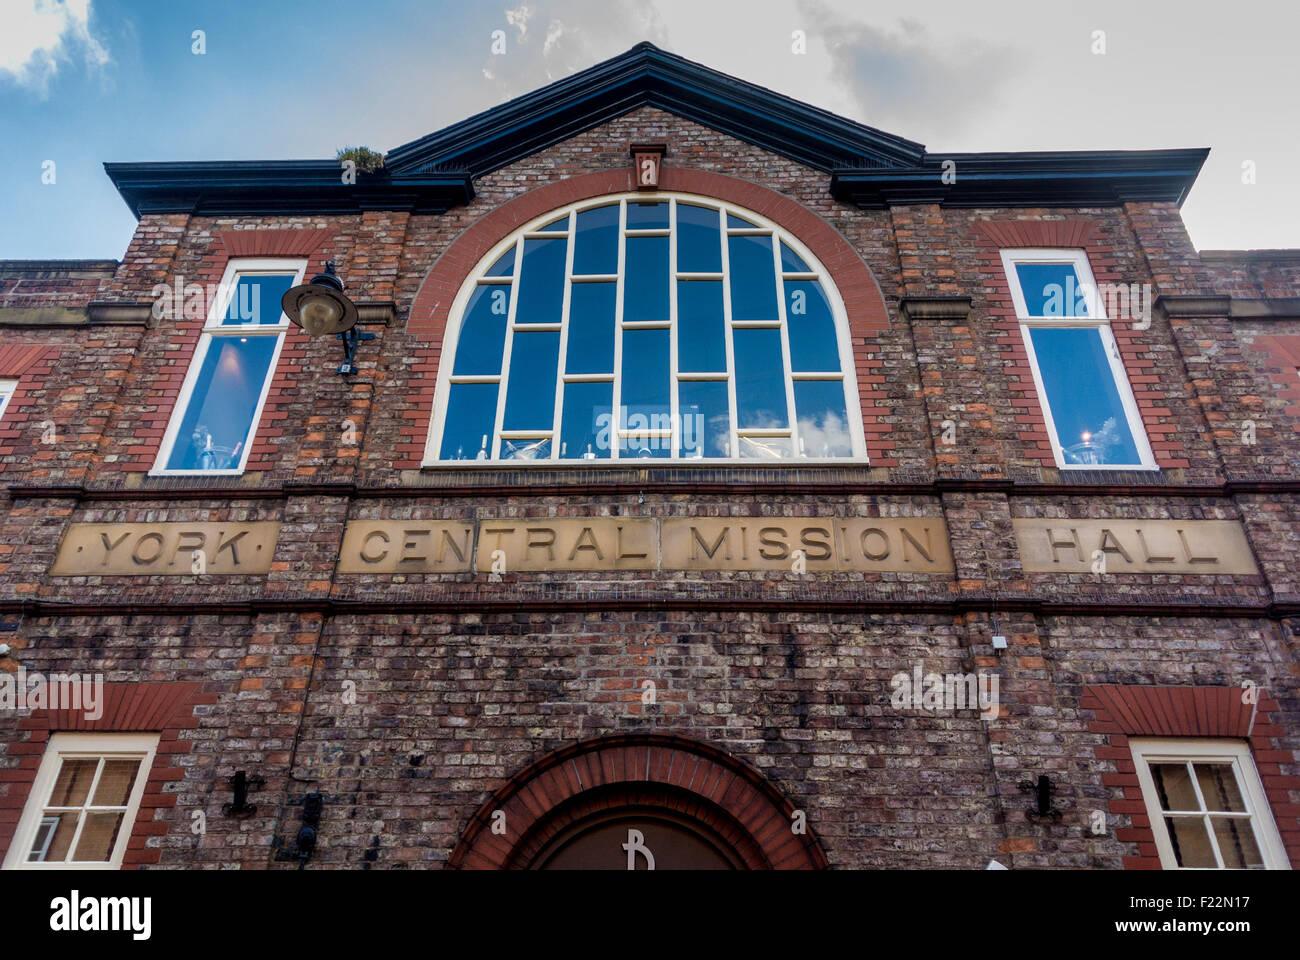 York Central Mission Hall building - Biltmore bar and restaurant - Stock Image